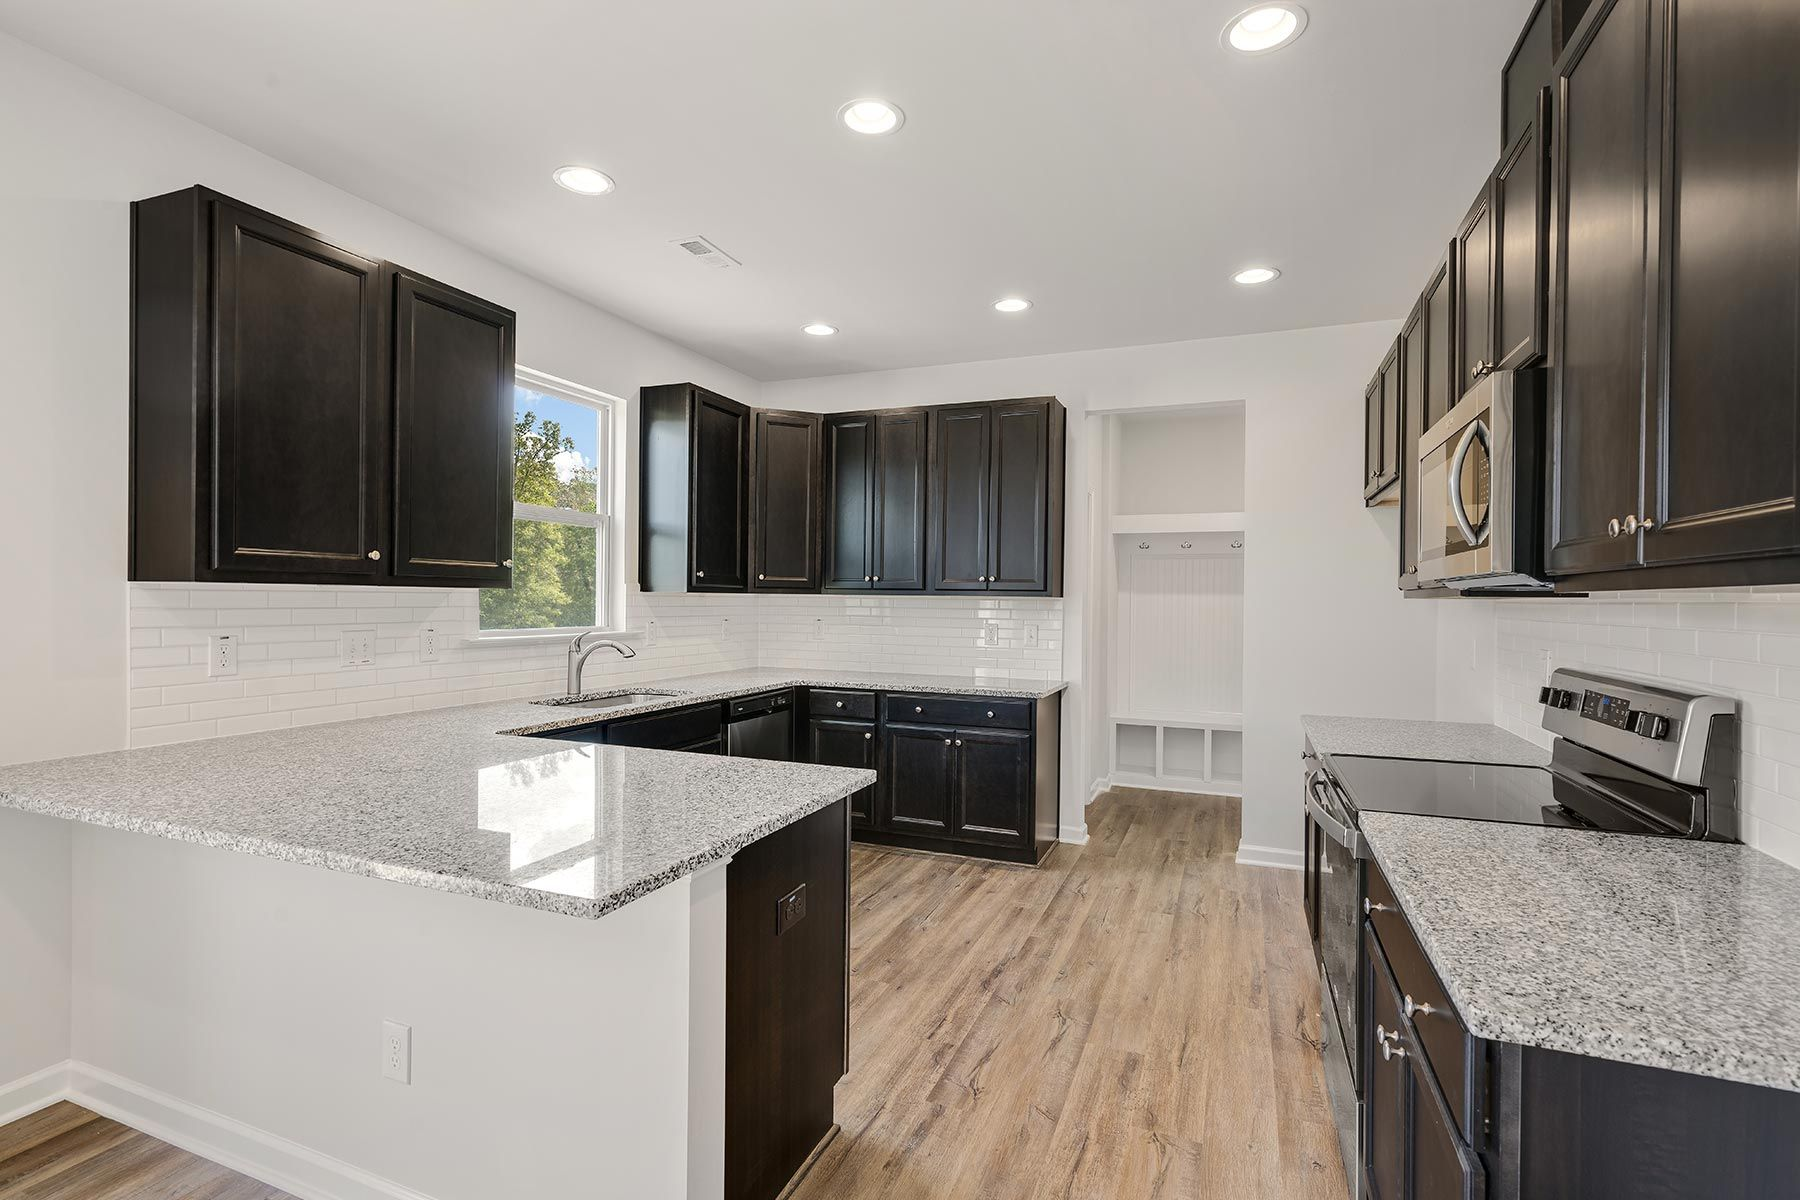 Interior:*Photo representation of the Reese floorplan